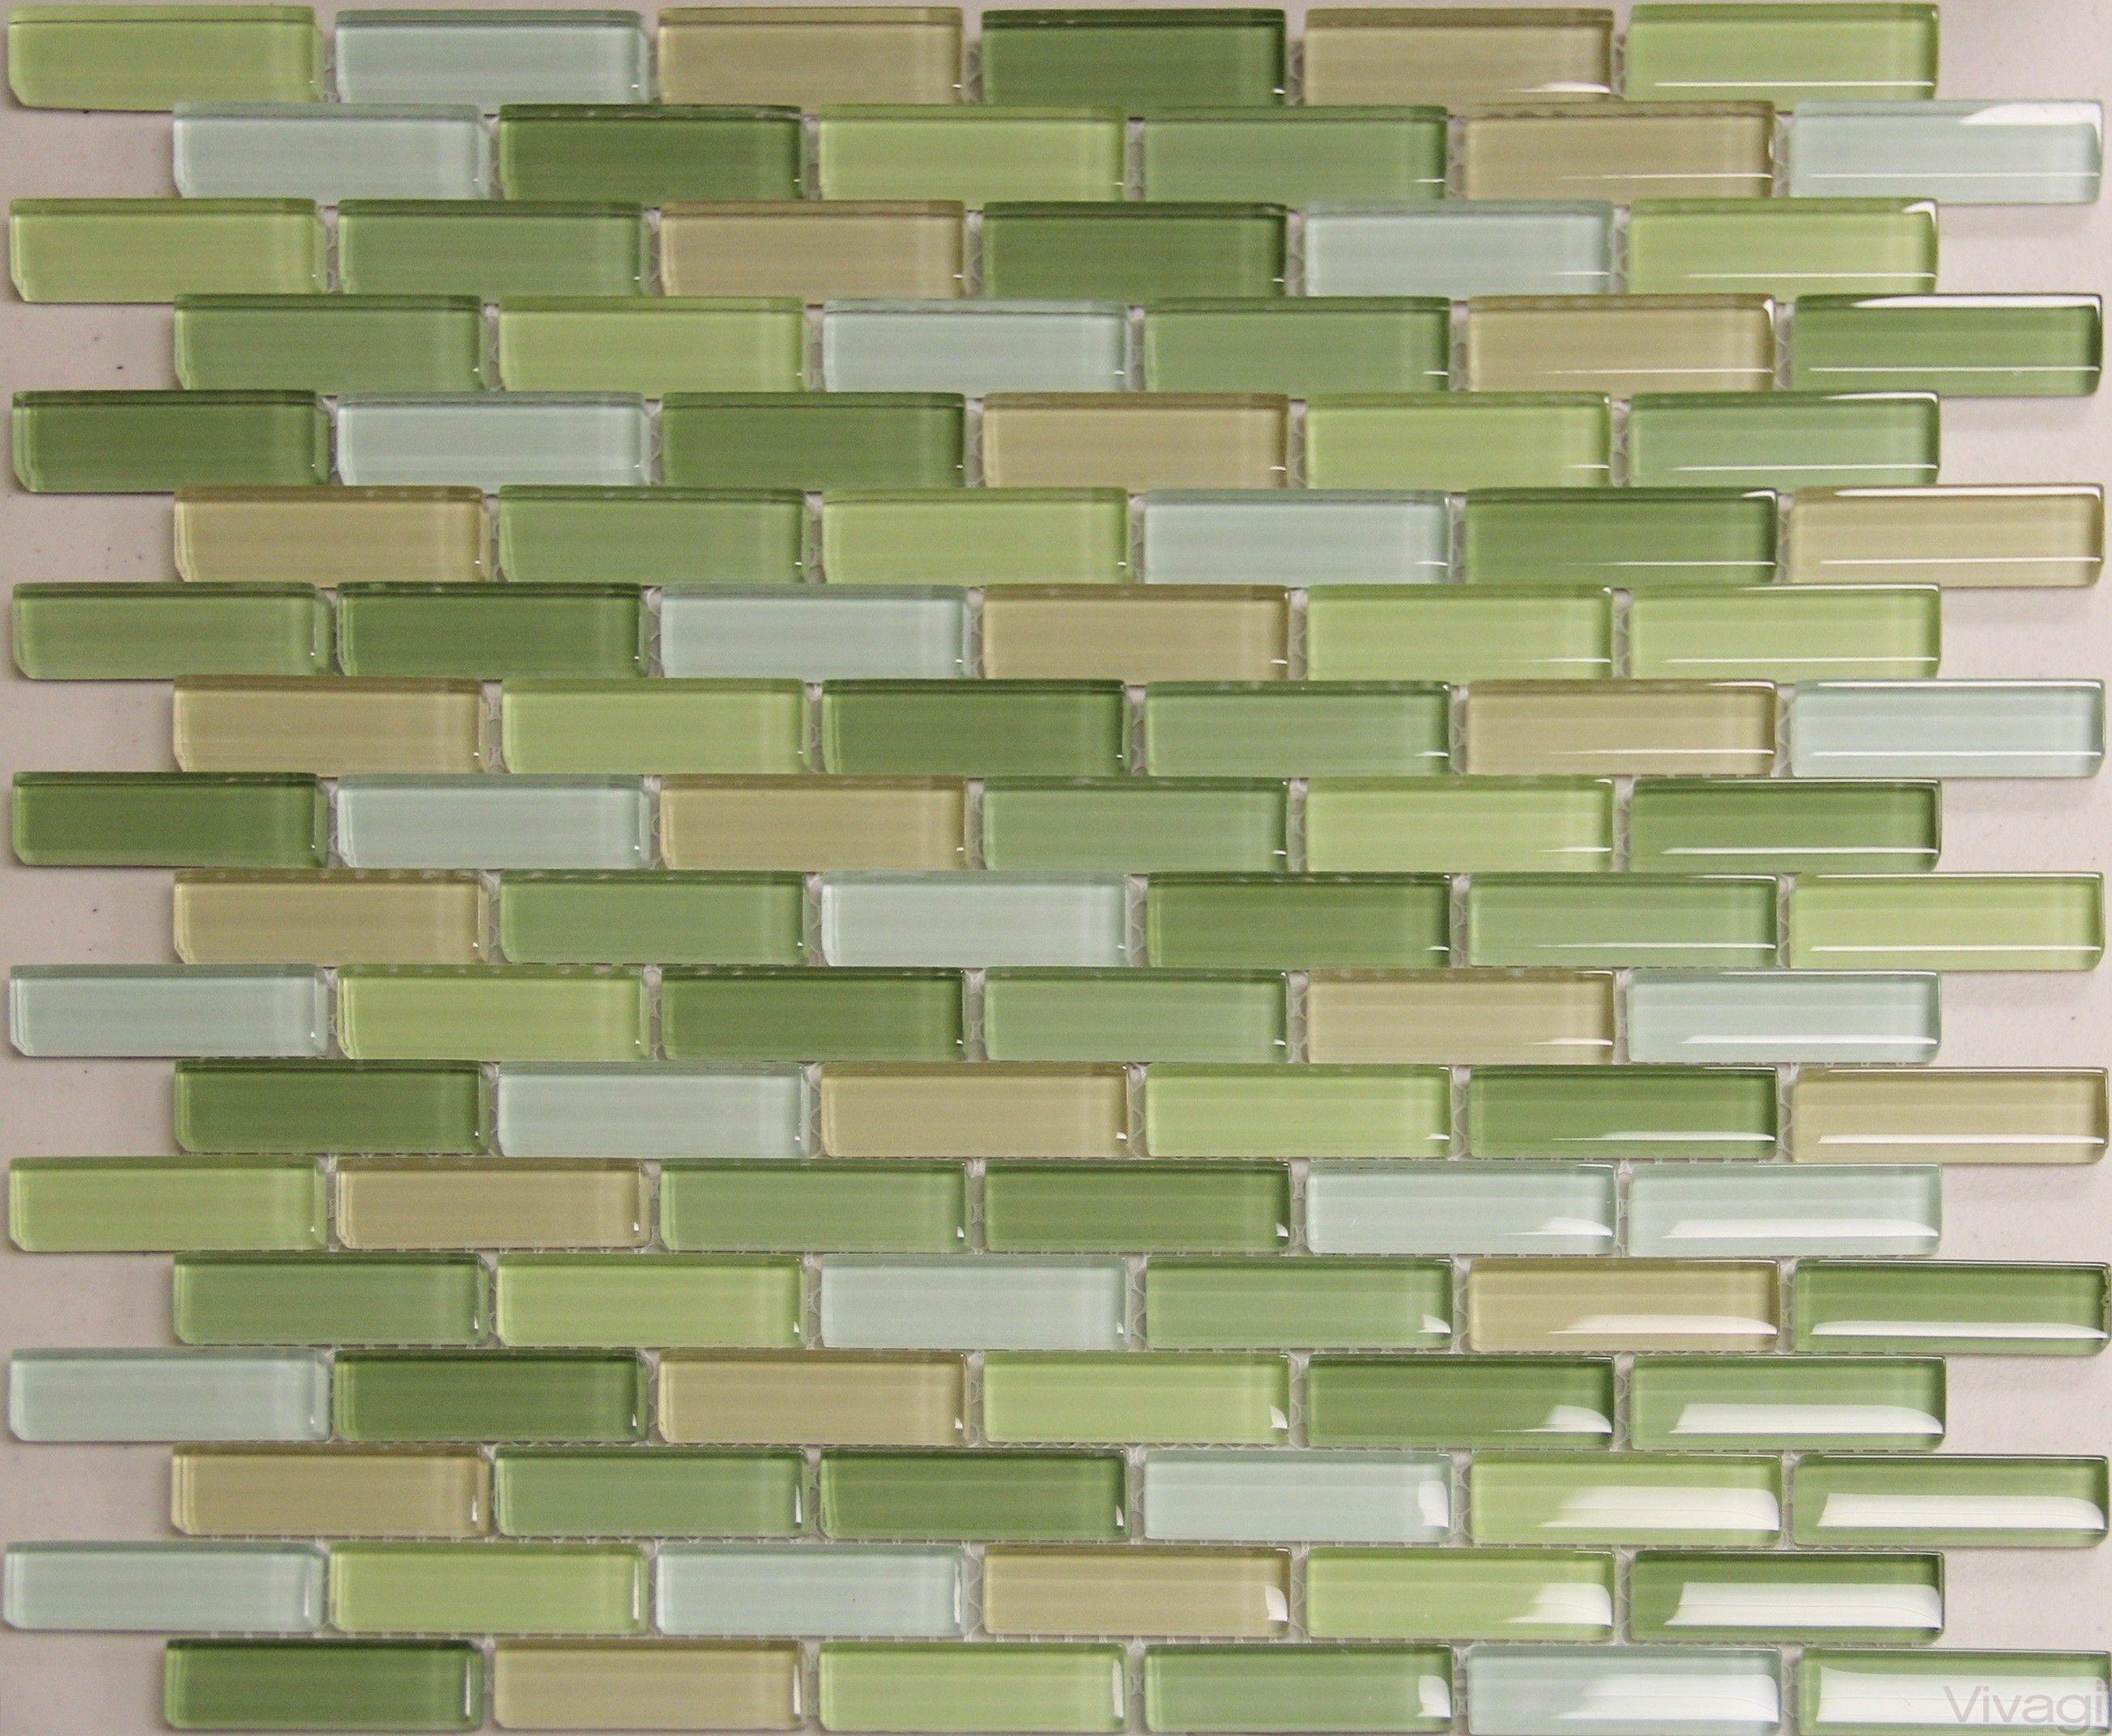 - Glass Tile Kitchen Backsplash D023 - Spring Subway Green, Subway